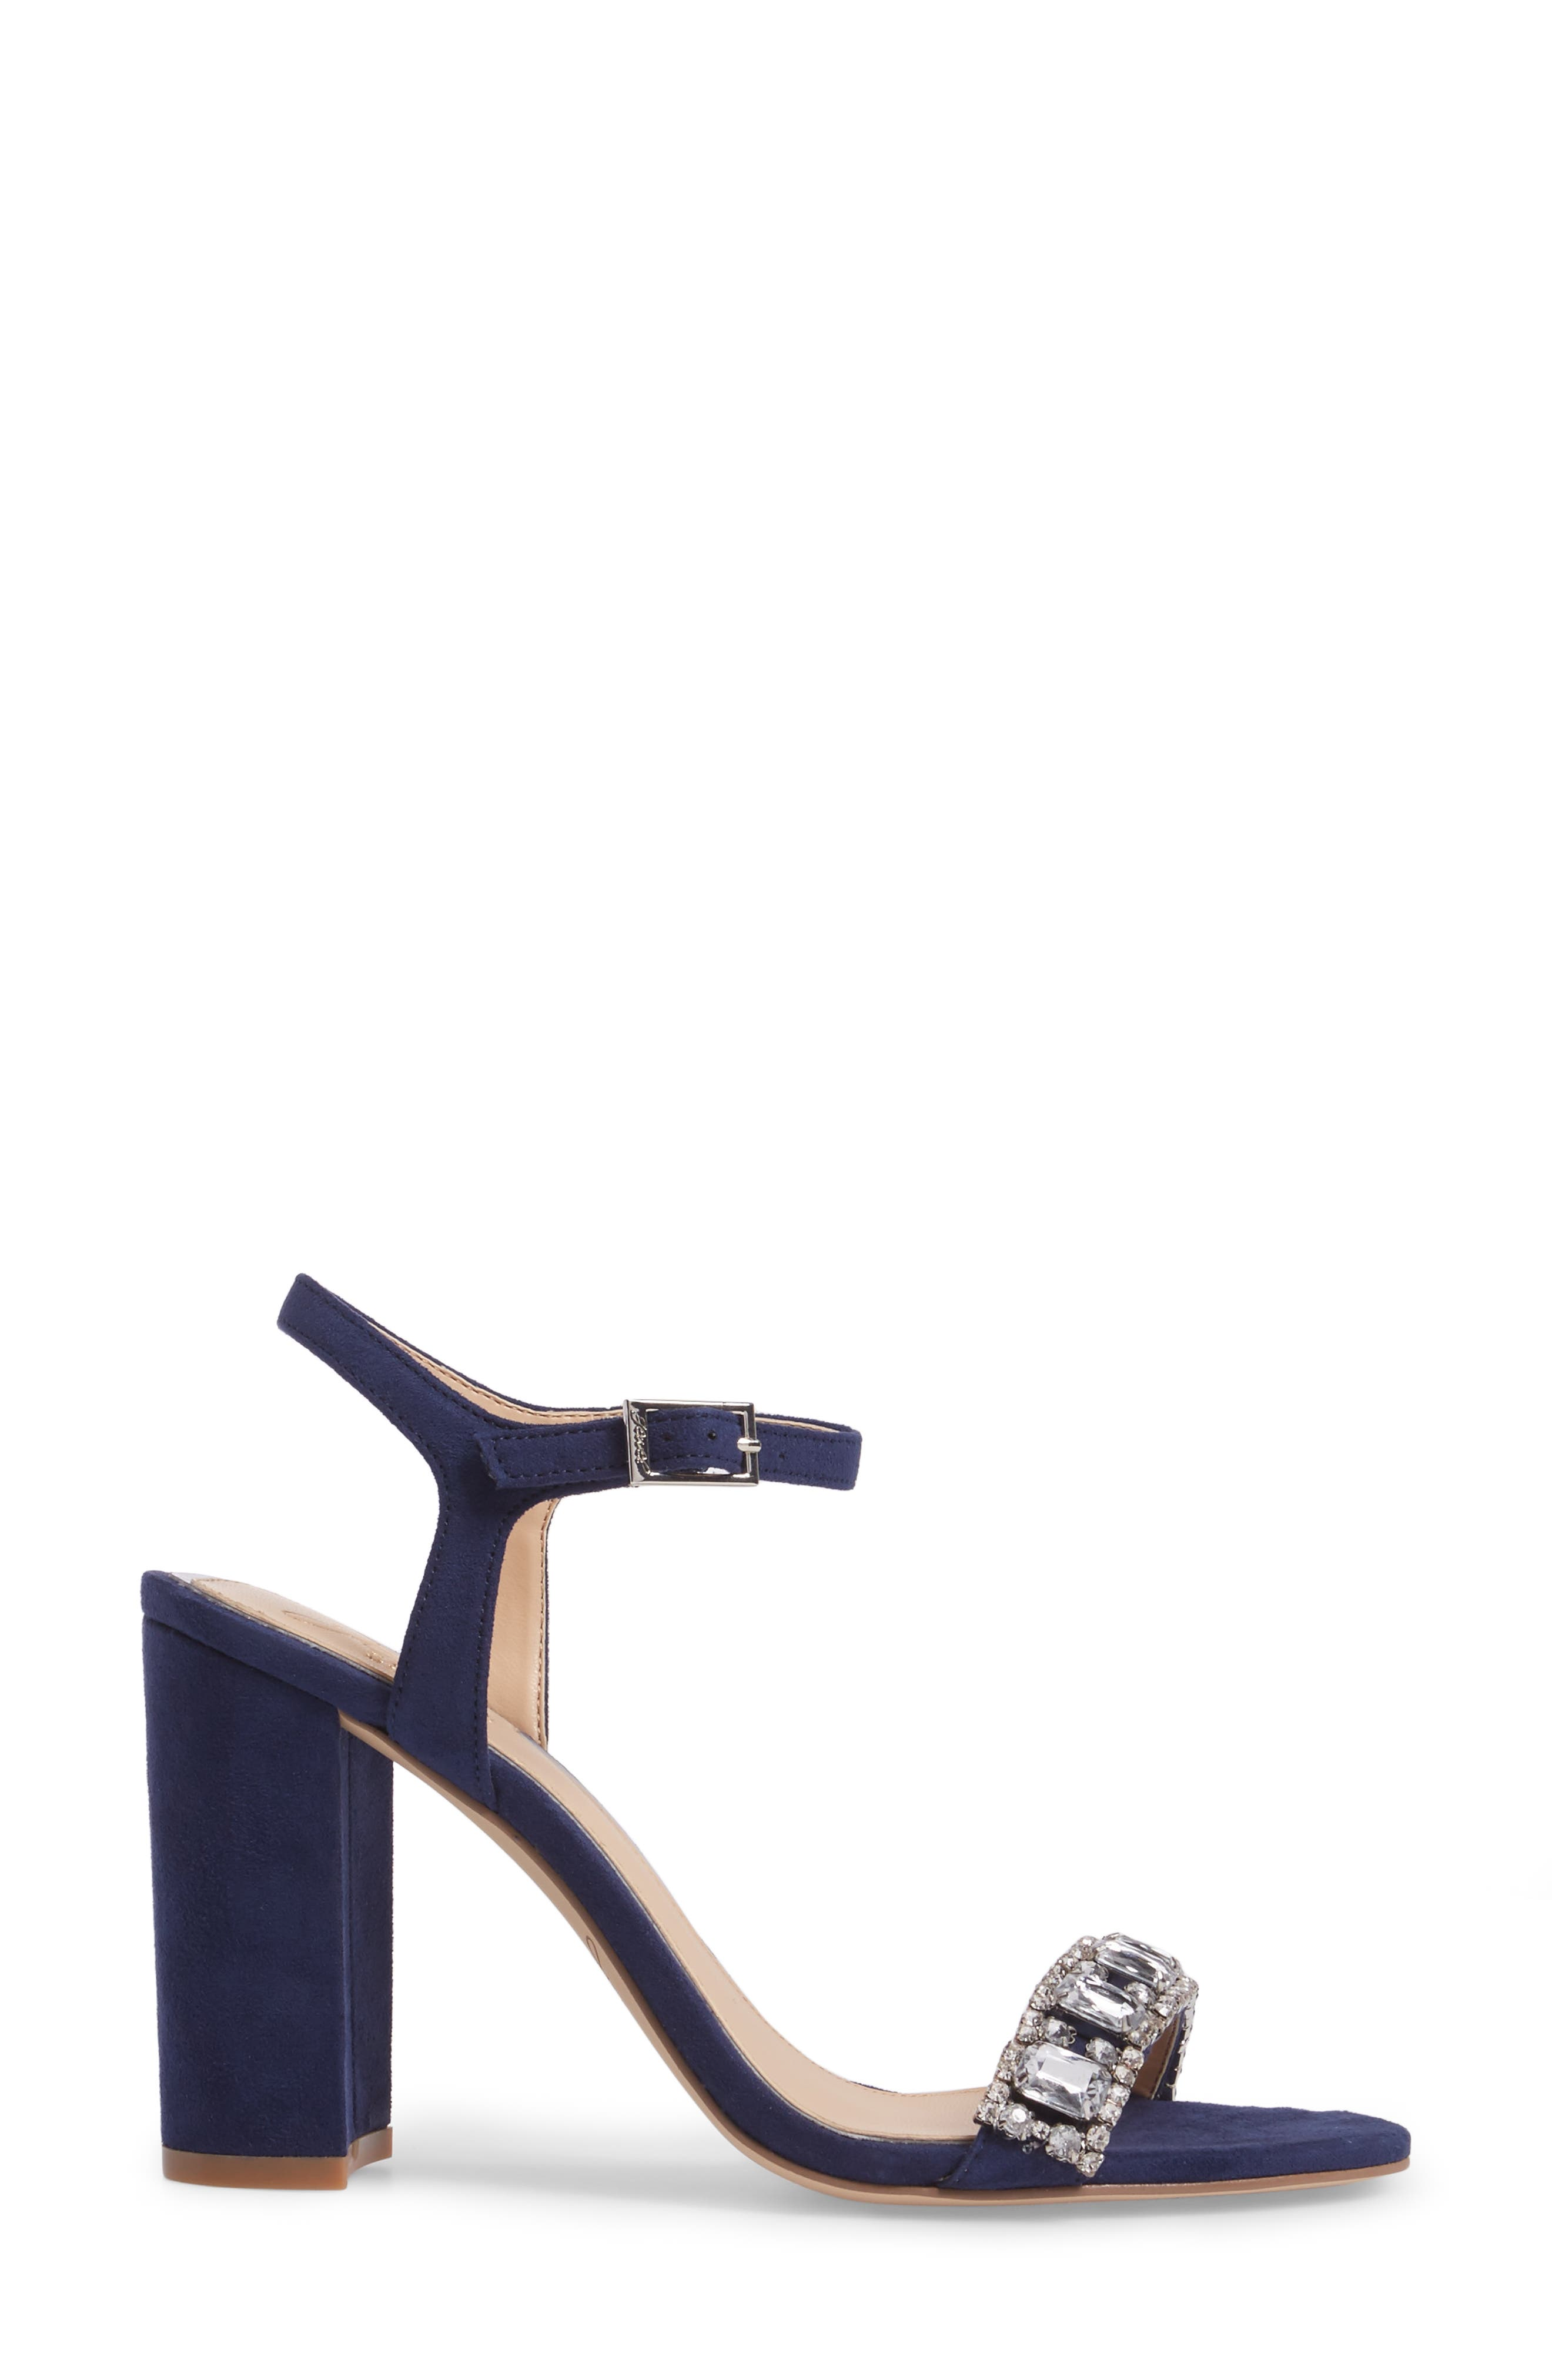 Hendricks Embellished Block Heel Sandal,                             Alternate thumbnail 3, color,                             Navy Suede